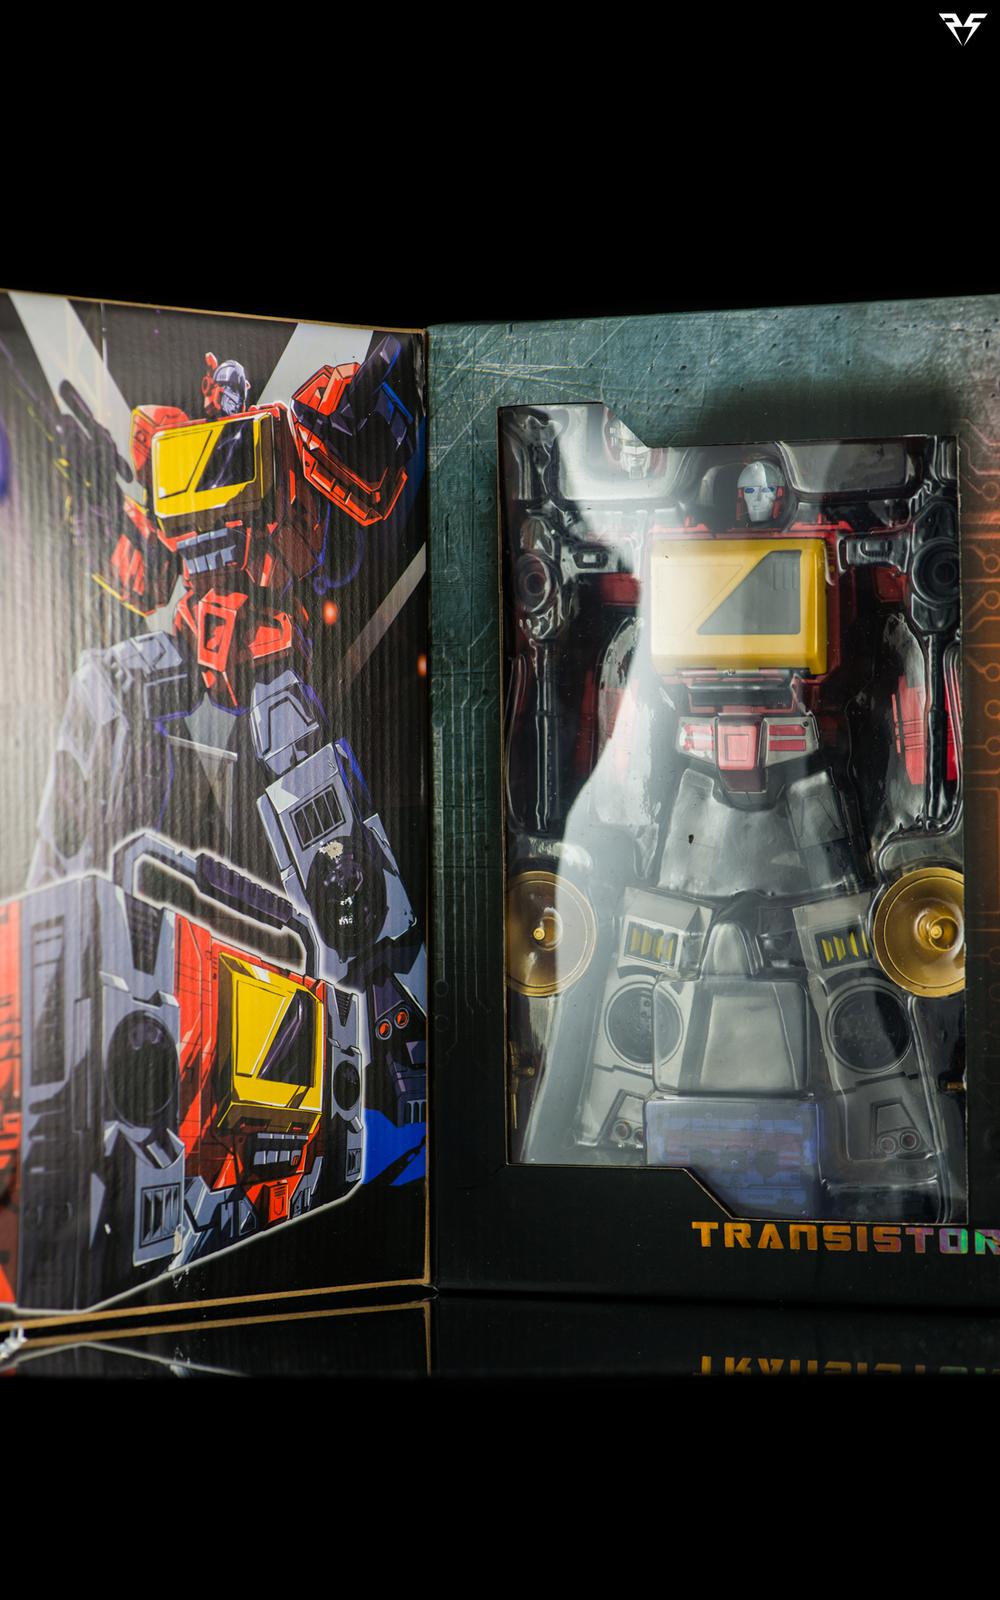 Transistorboxfold.jpg